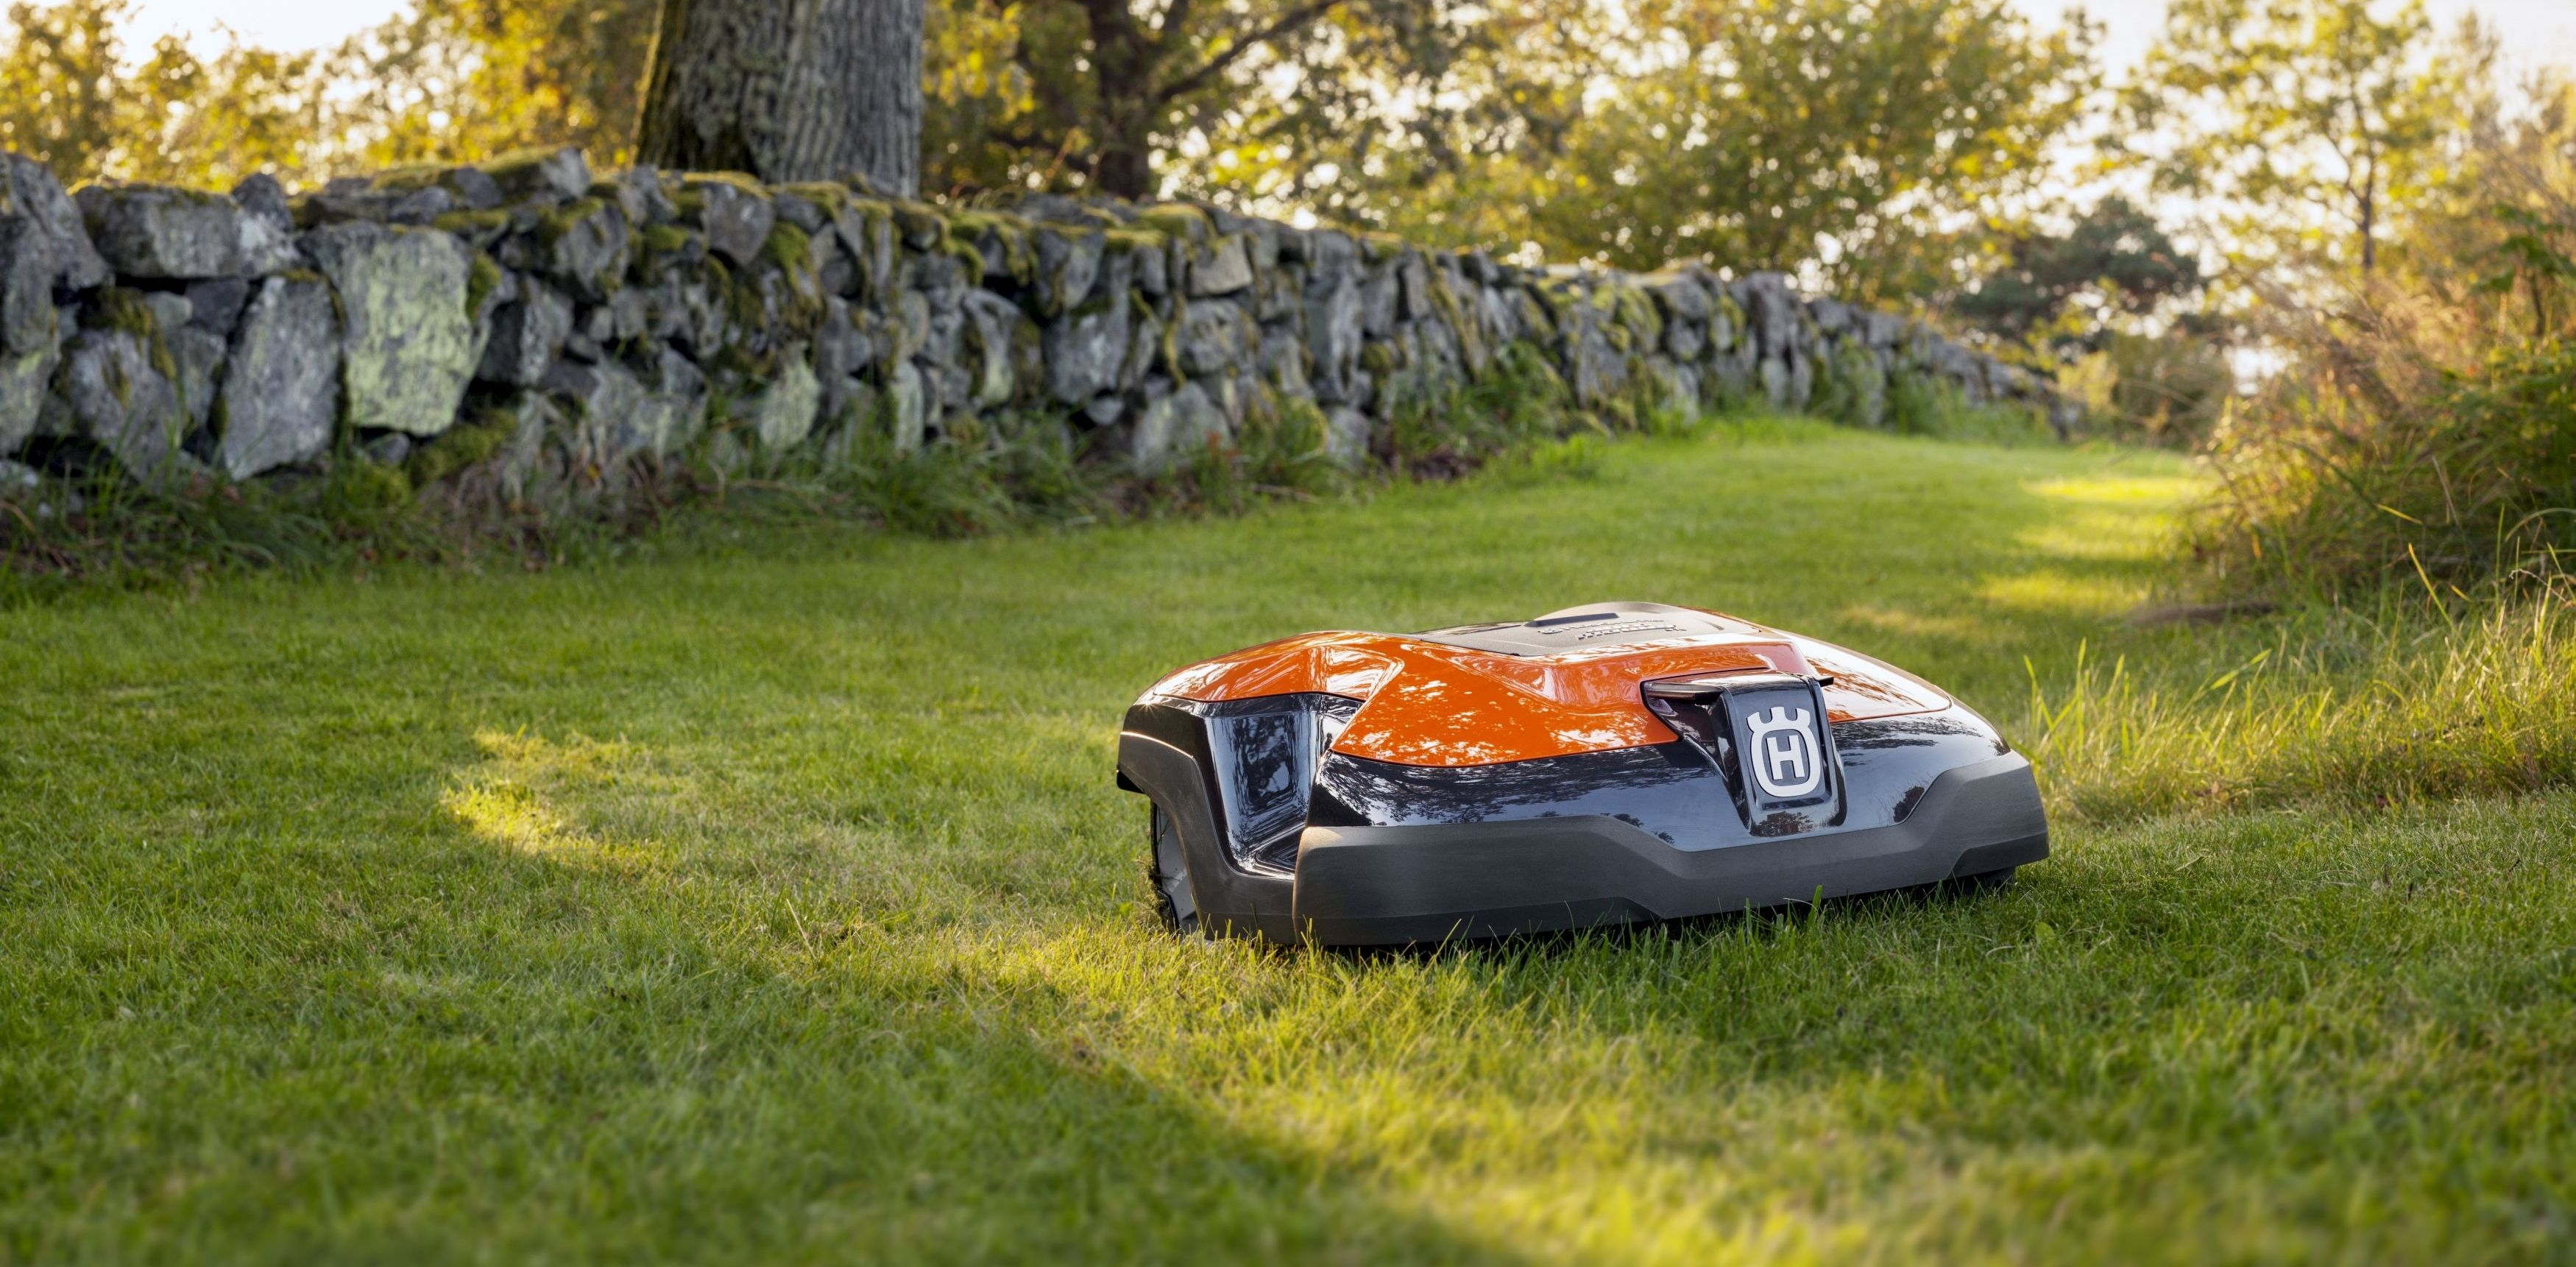 neuer automower 310 in orange automower rasenroboter rasenm her roboter pinterest. Black Bedroom Furniture Sets. Home Design Ideas